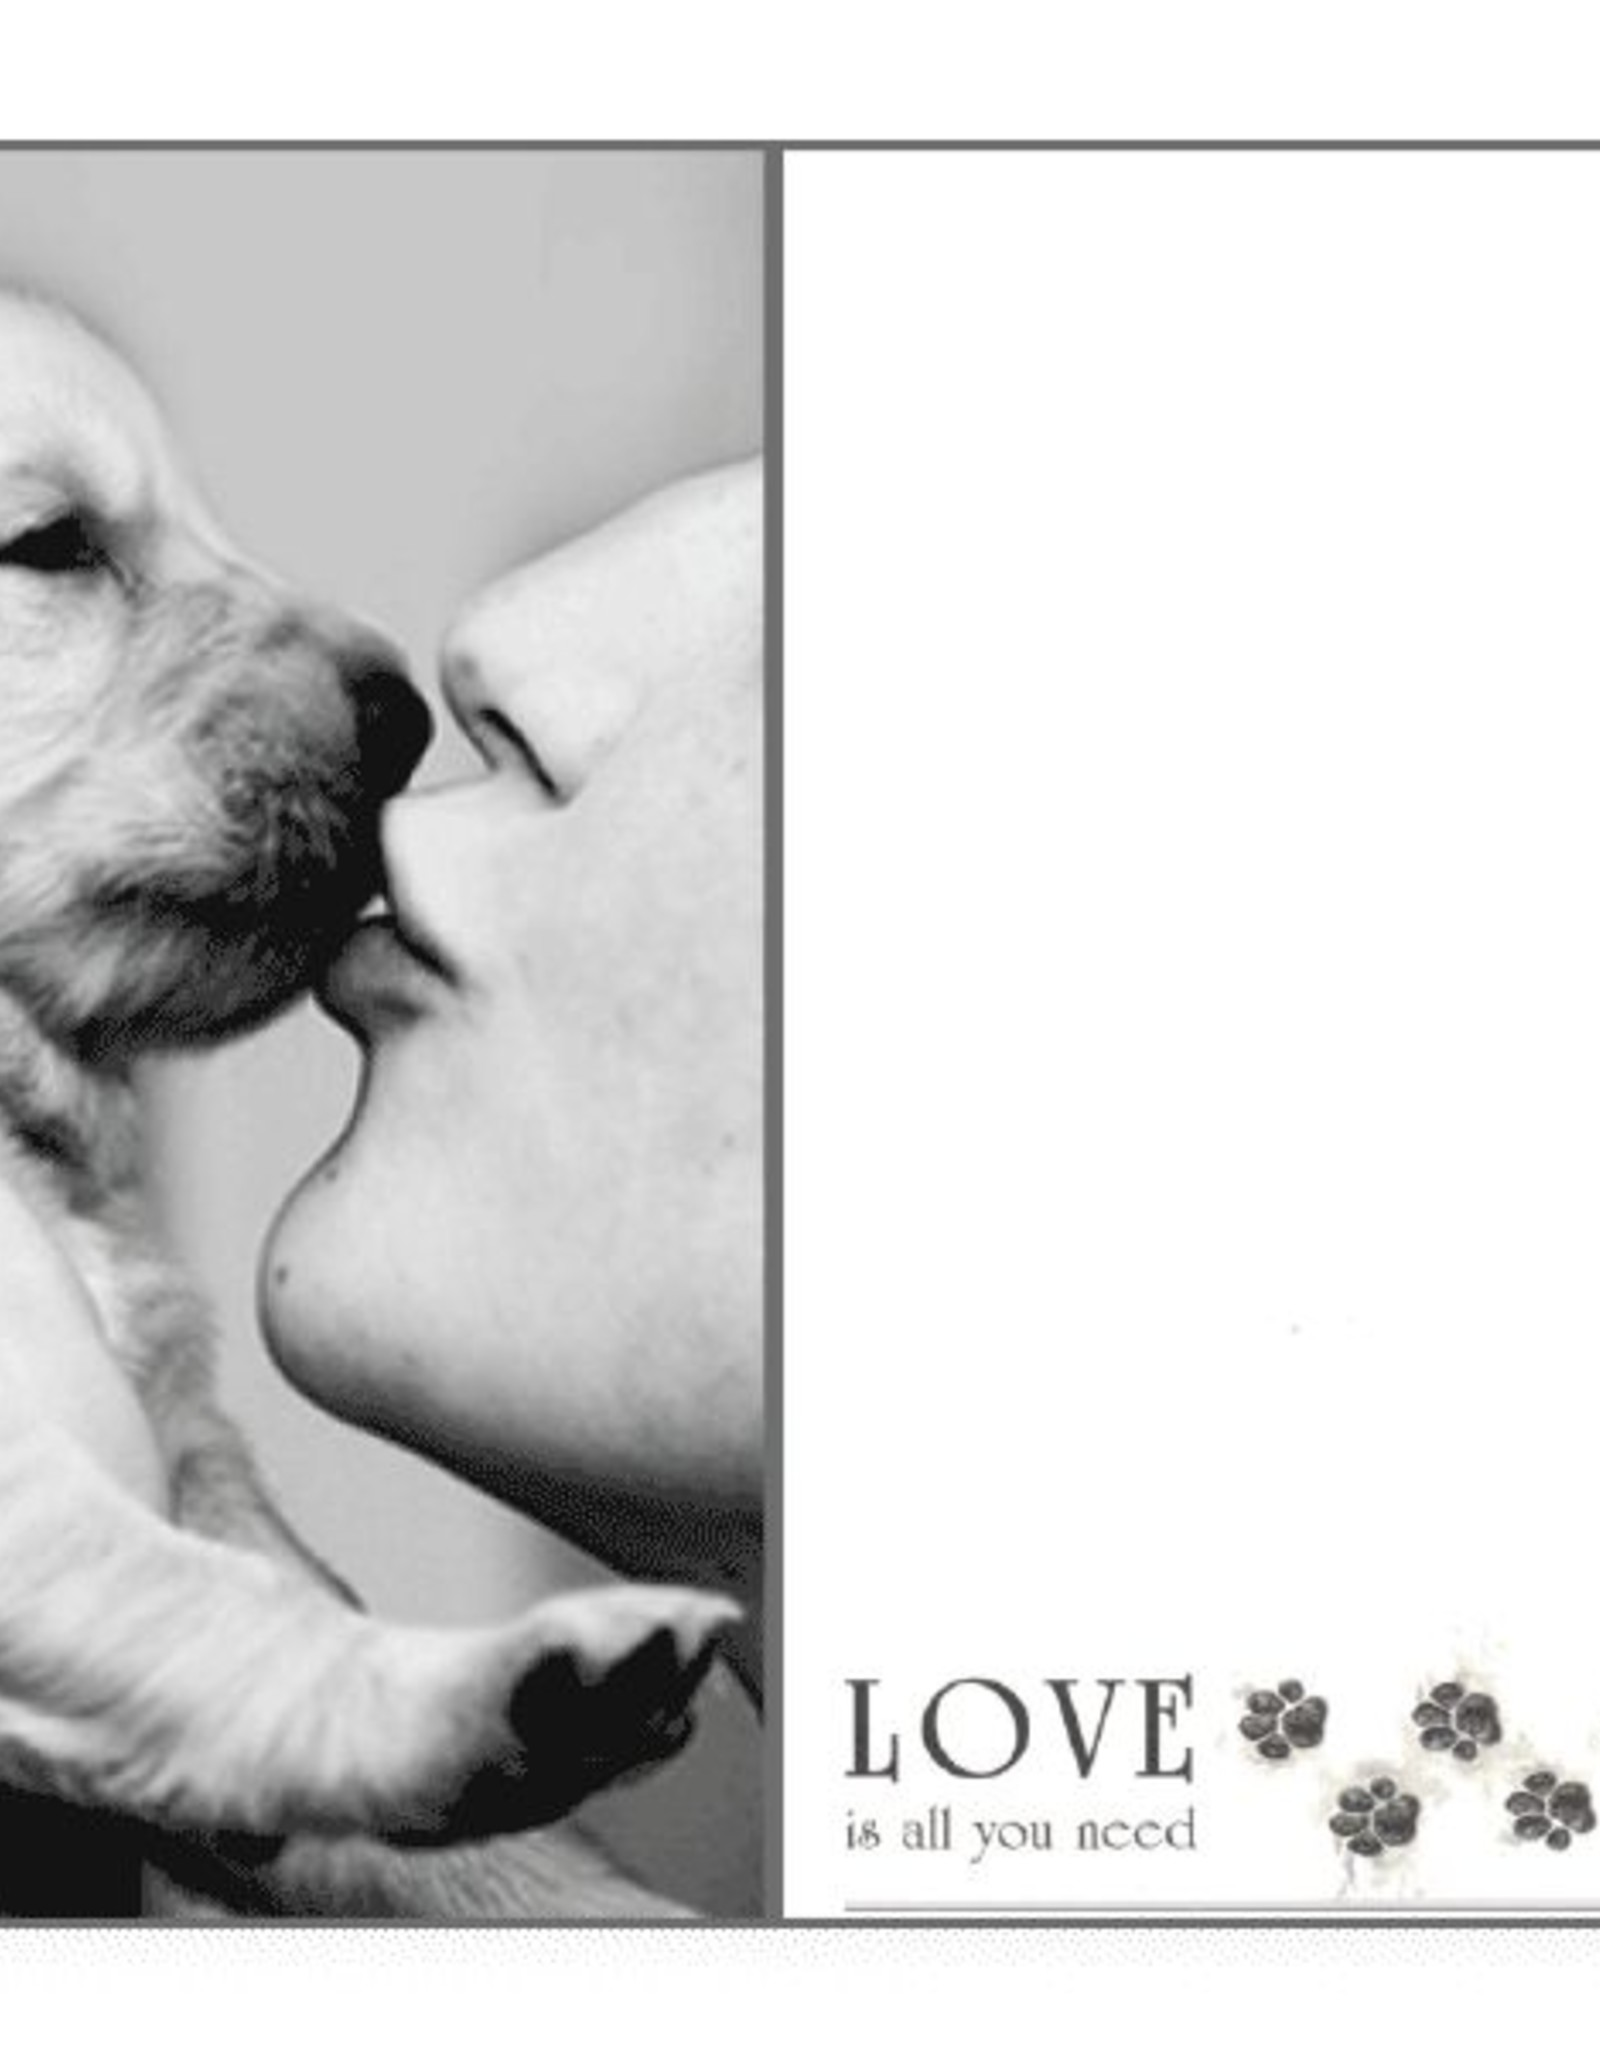 Dog Speak Dog Speak Card - Love - Love Is All You Need